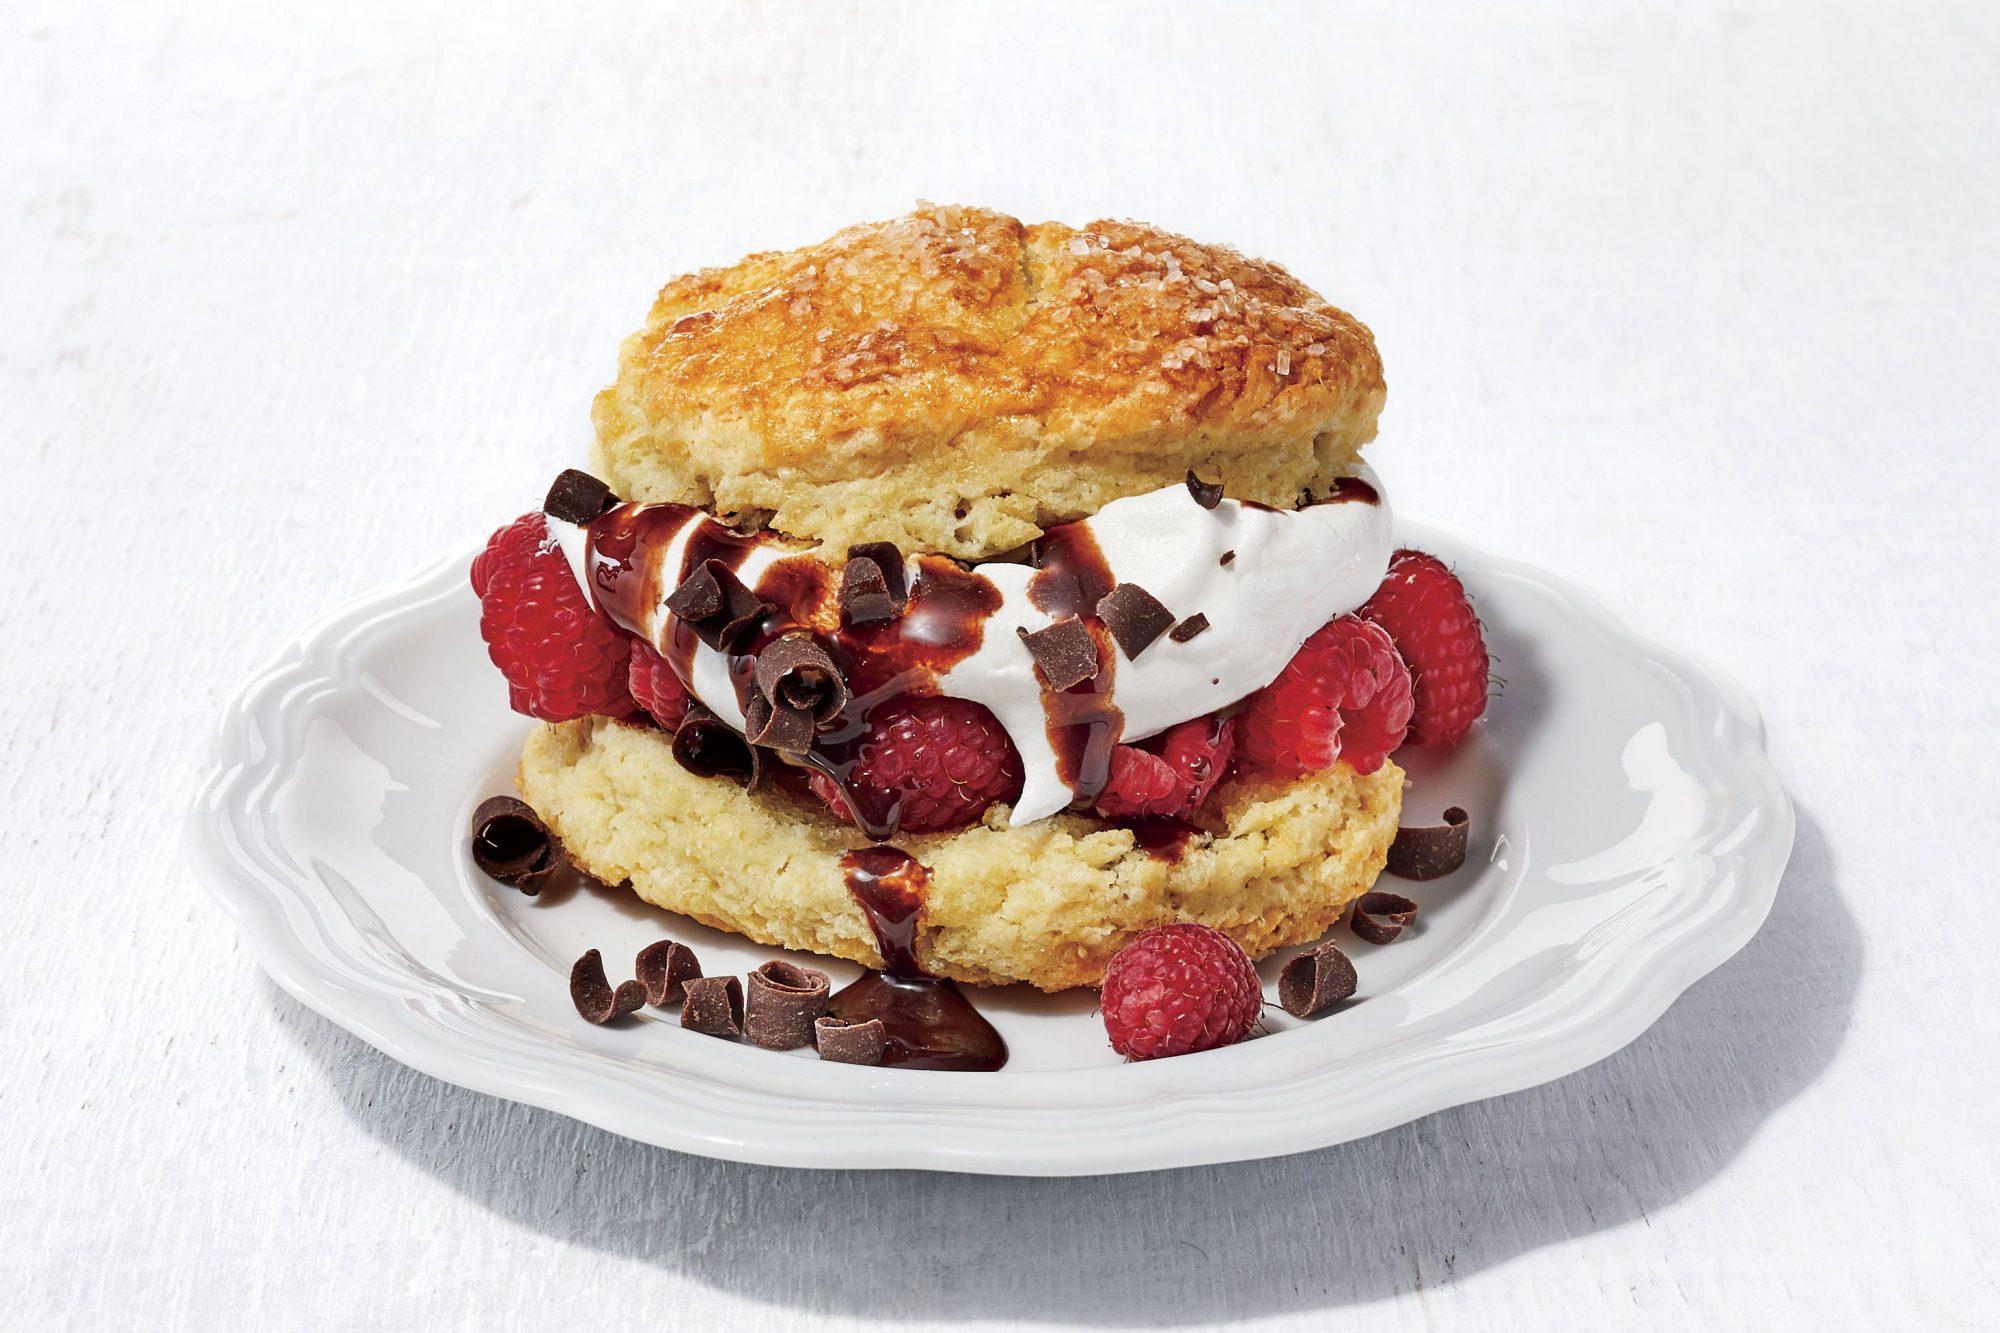 Raspberry Truffle Shortcake